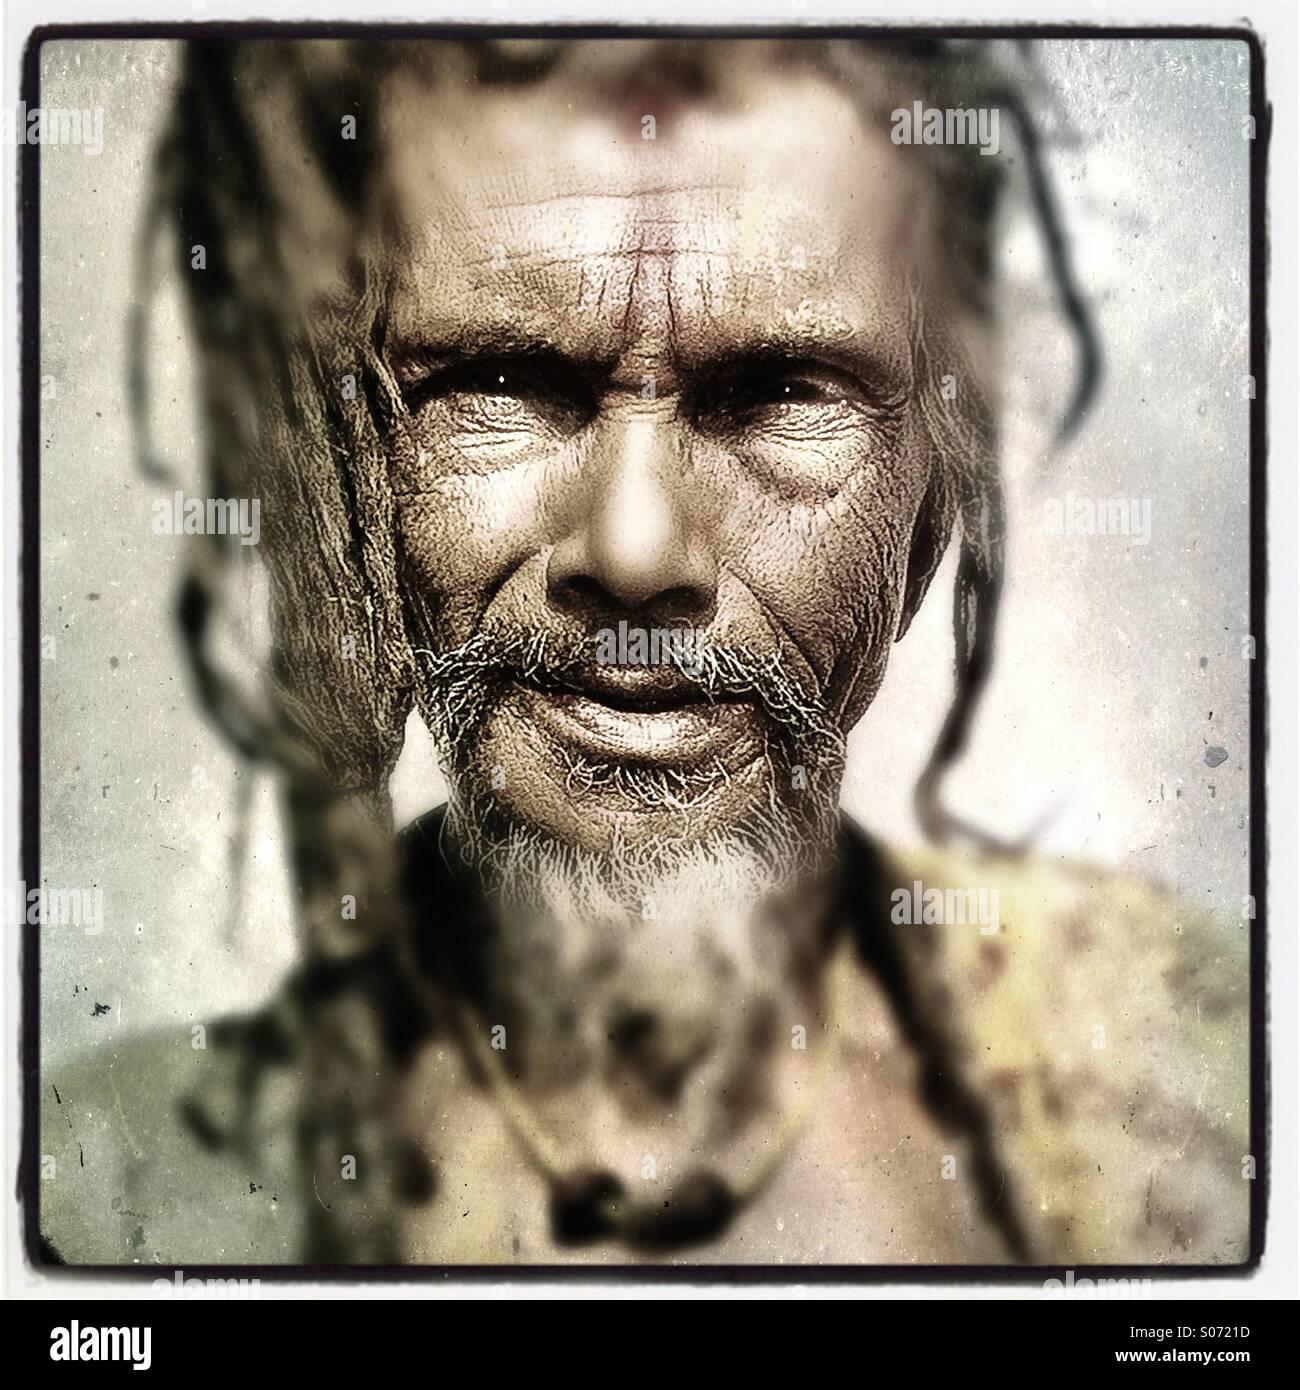 A Sadhu Hindu holy man - Stock Image